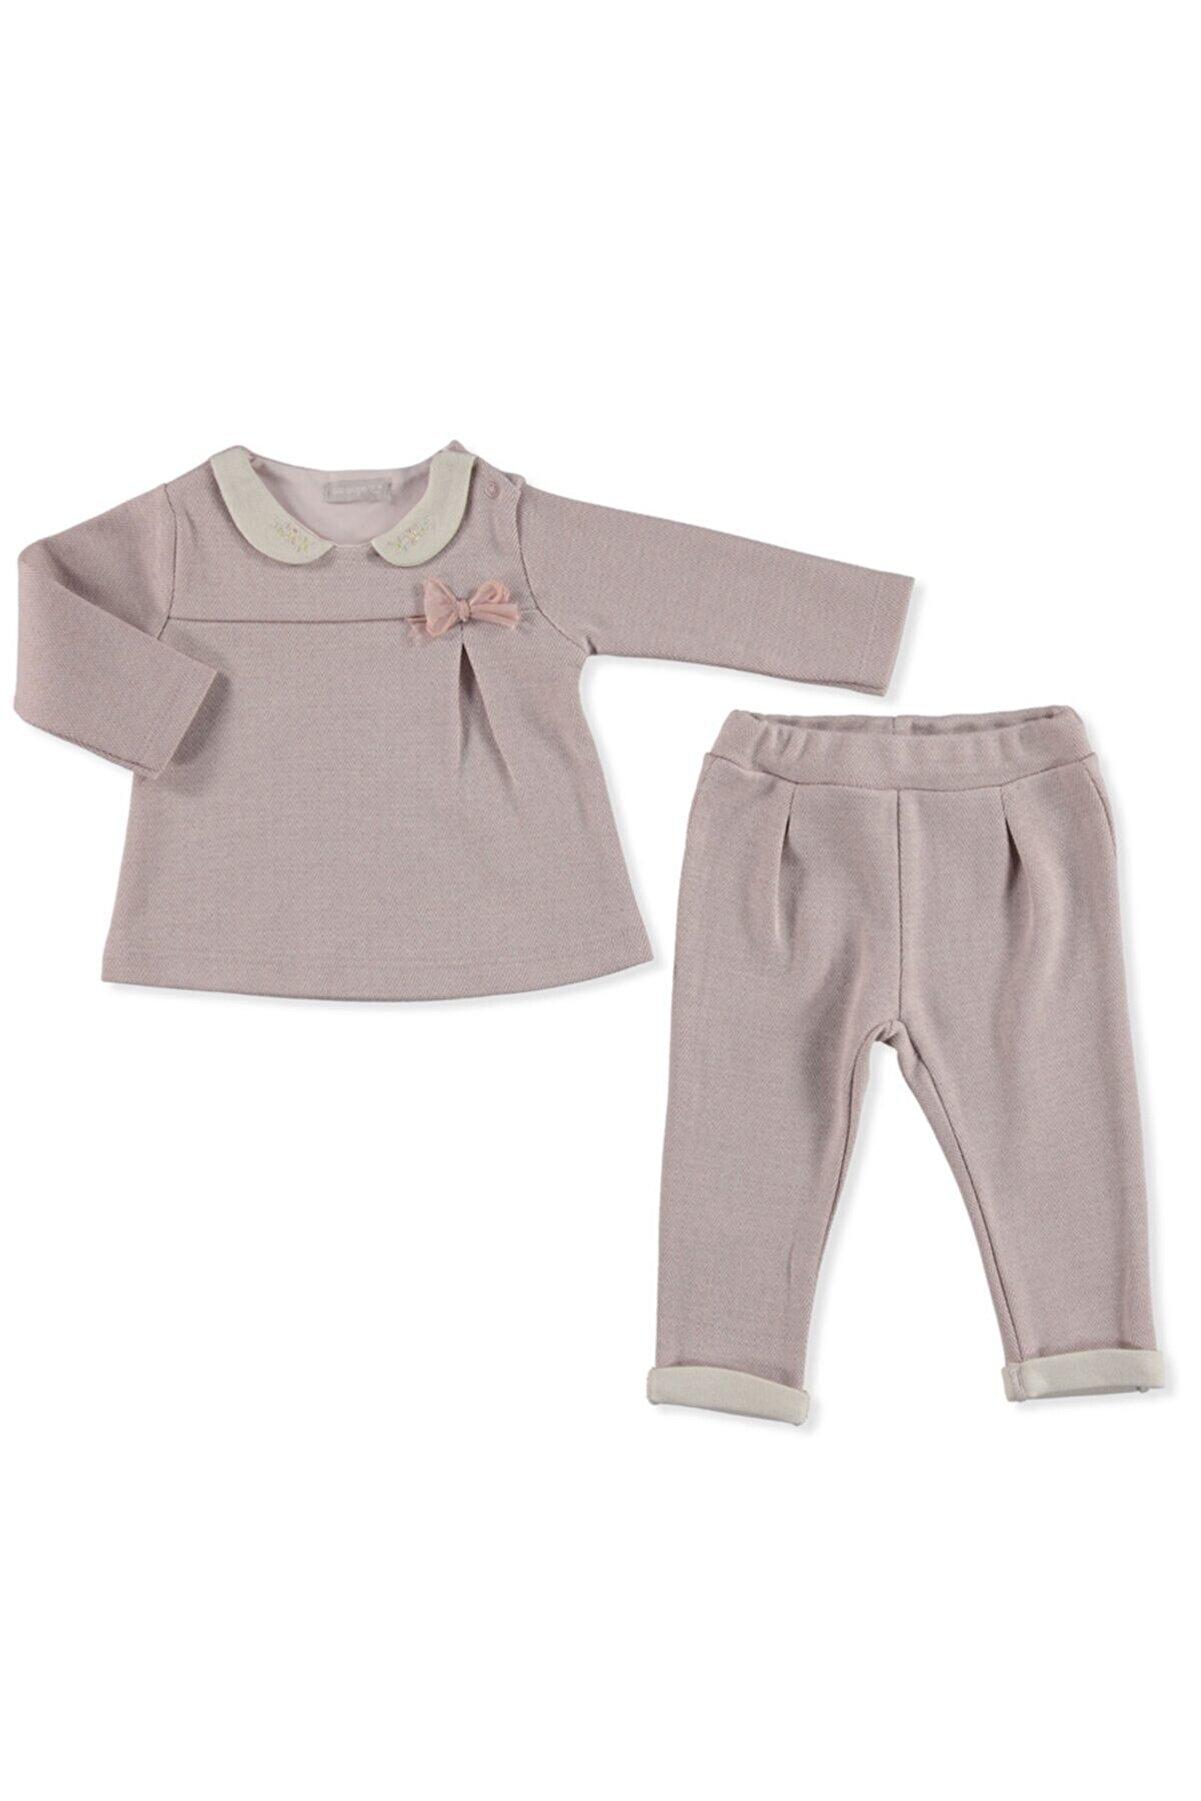 Cassiope Cute 2li Takım Sweatshirt Pantolon